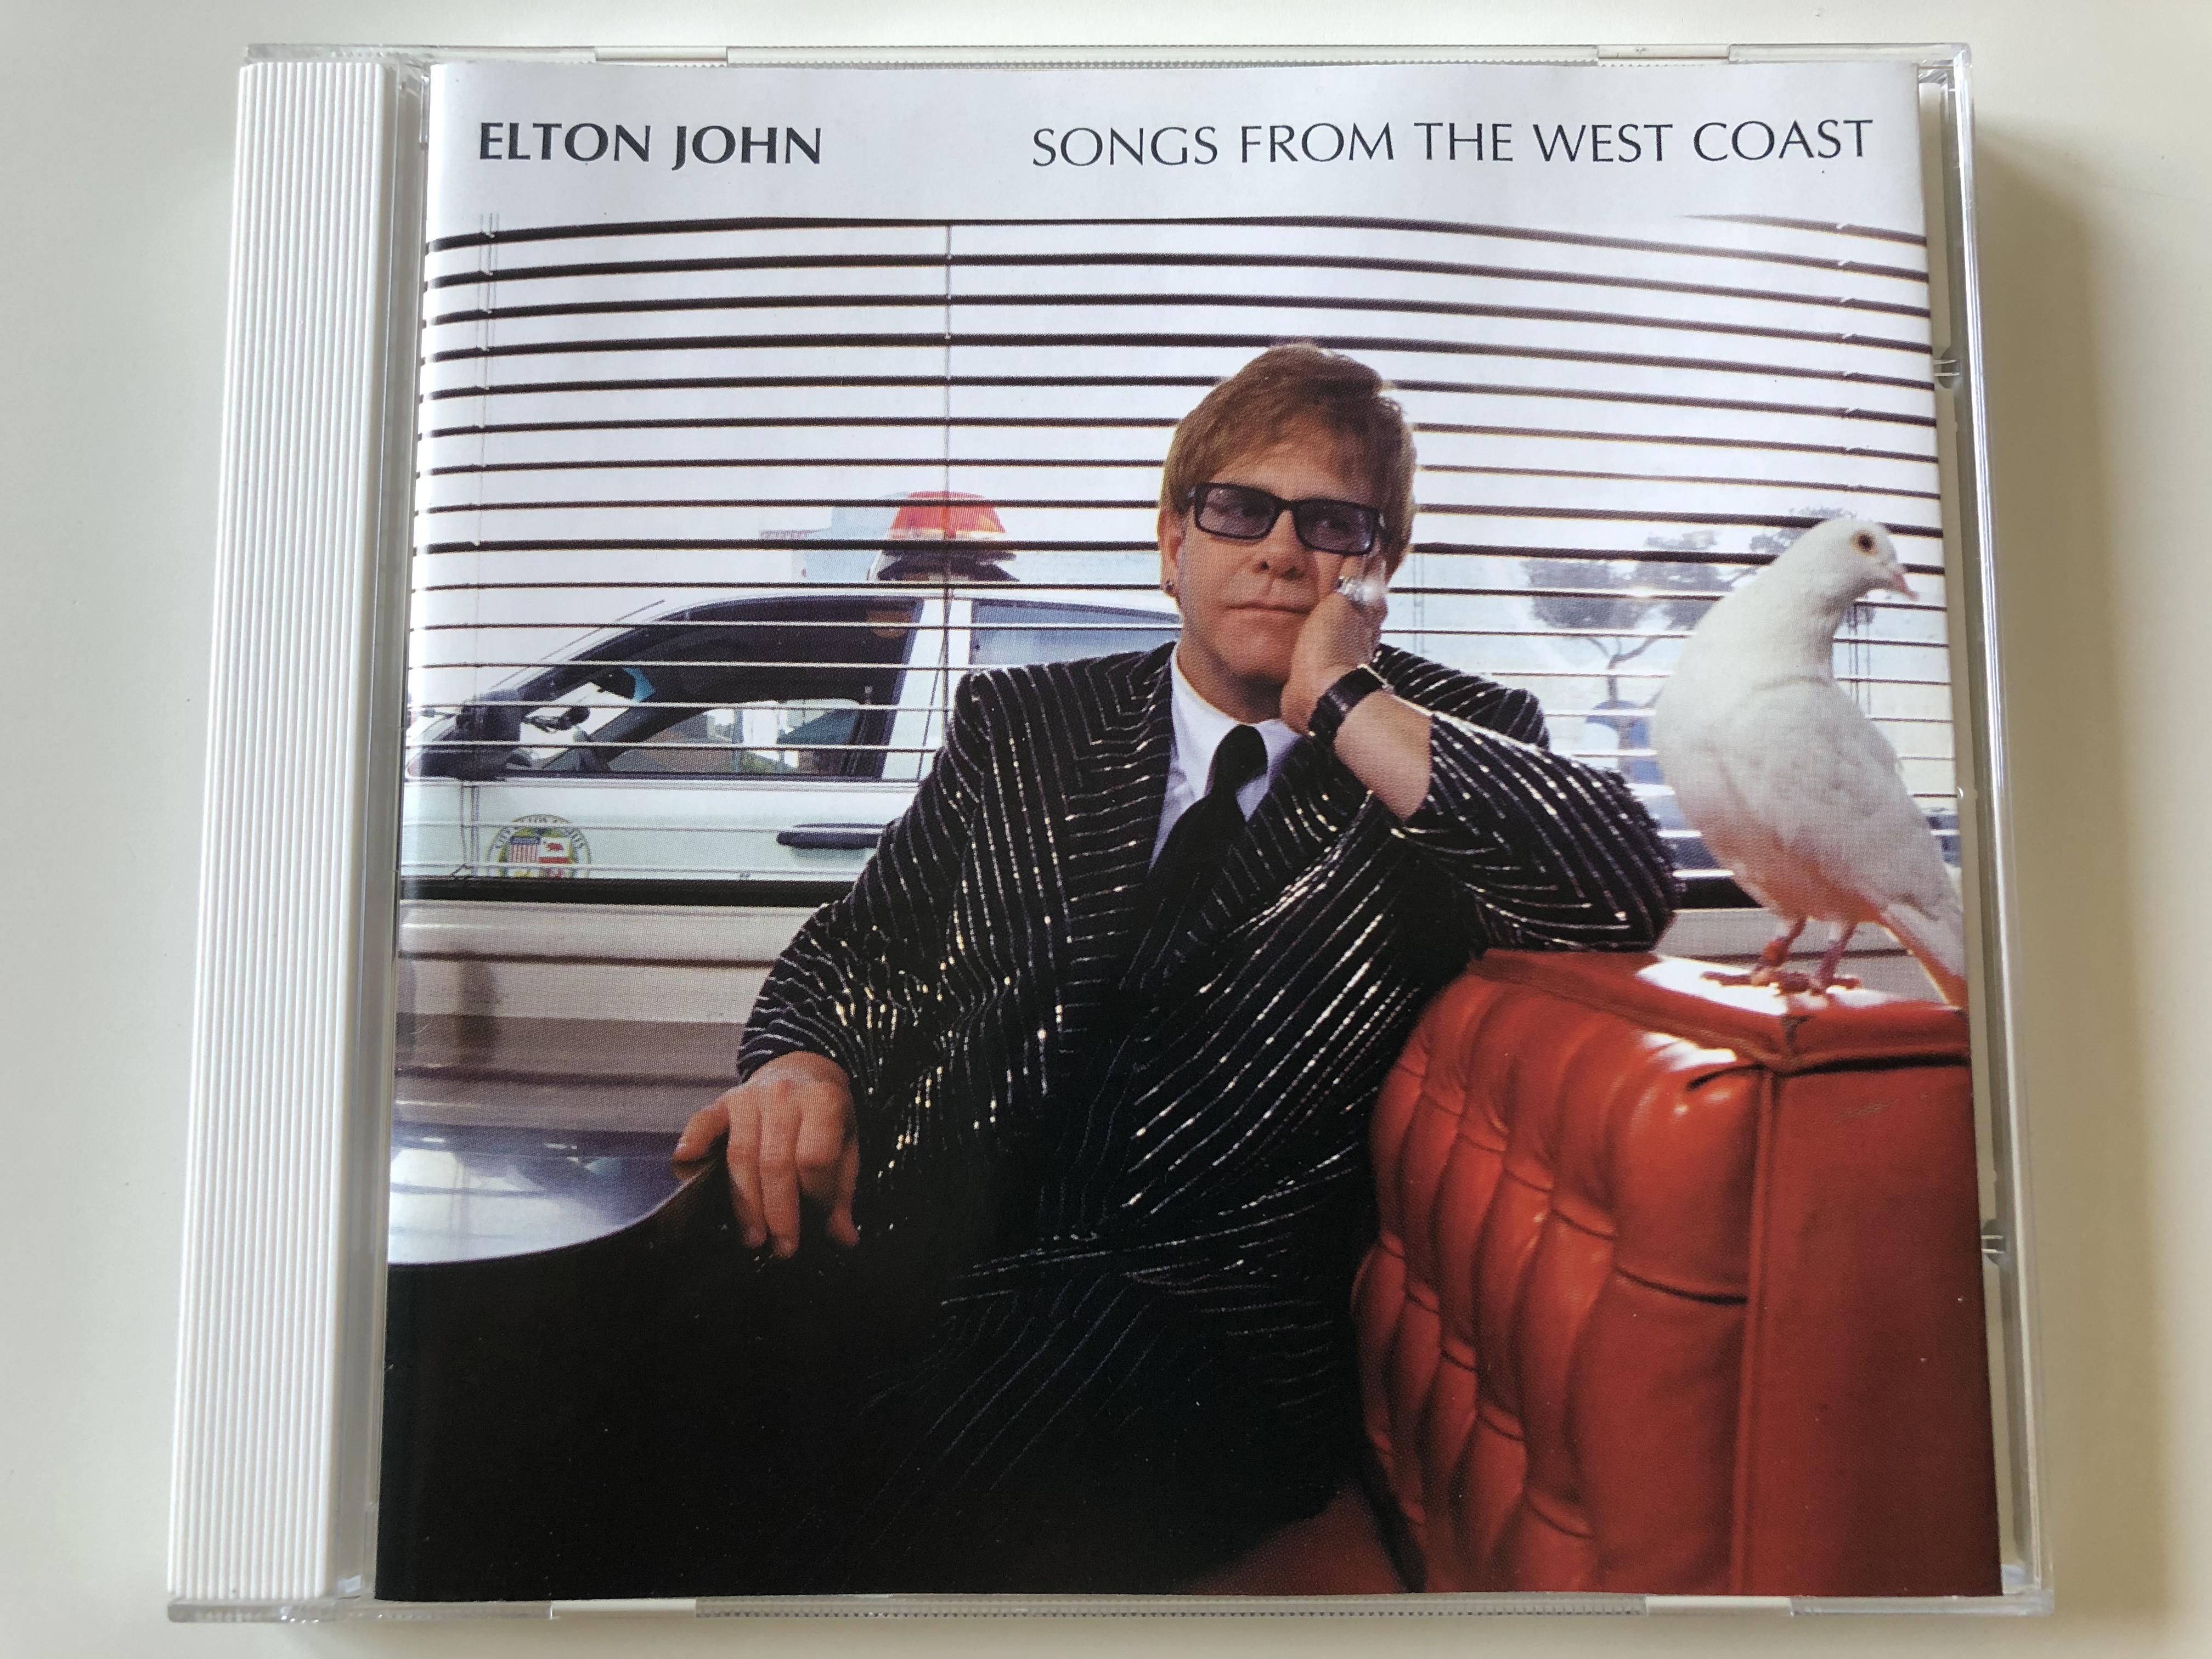 elton-john-songs-from-the-west-coast-mercury-audio-cd-2001-586-459-2-1-.jpg